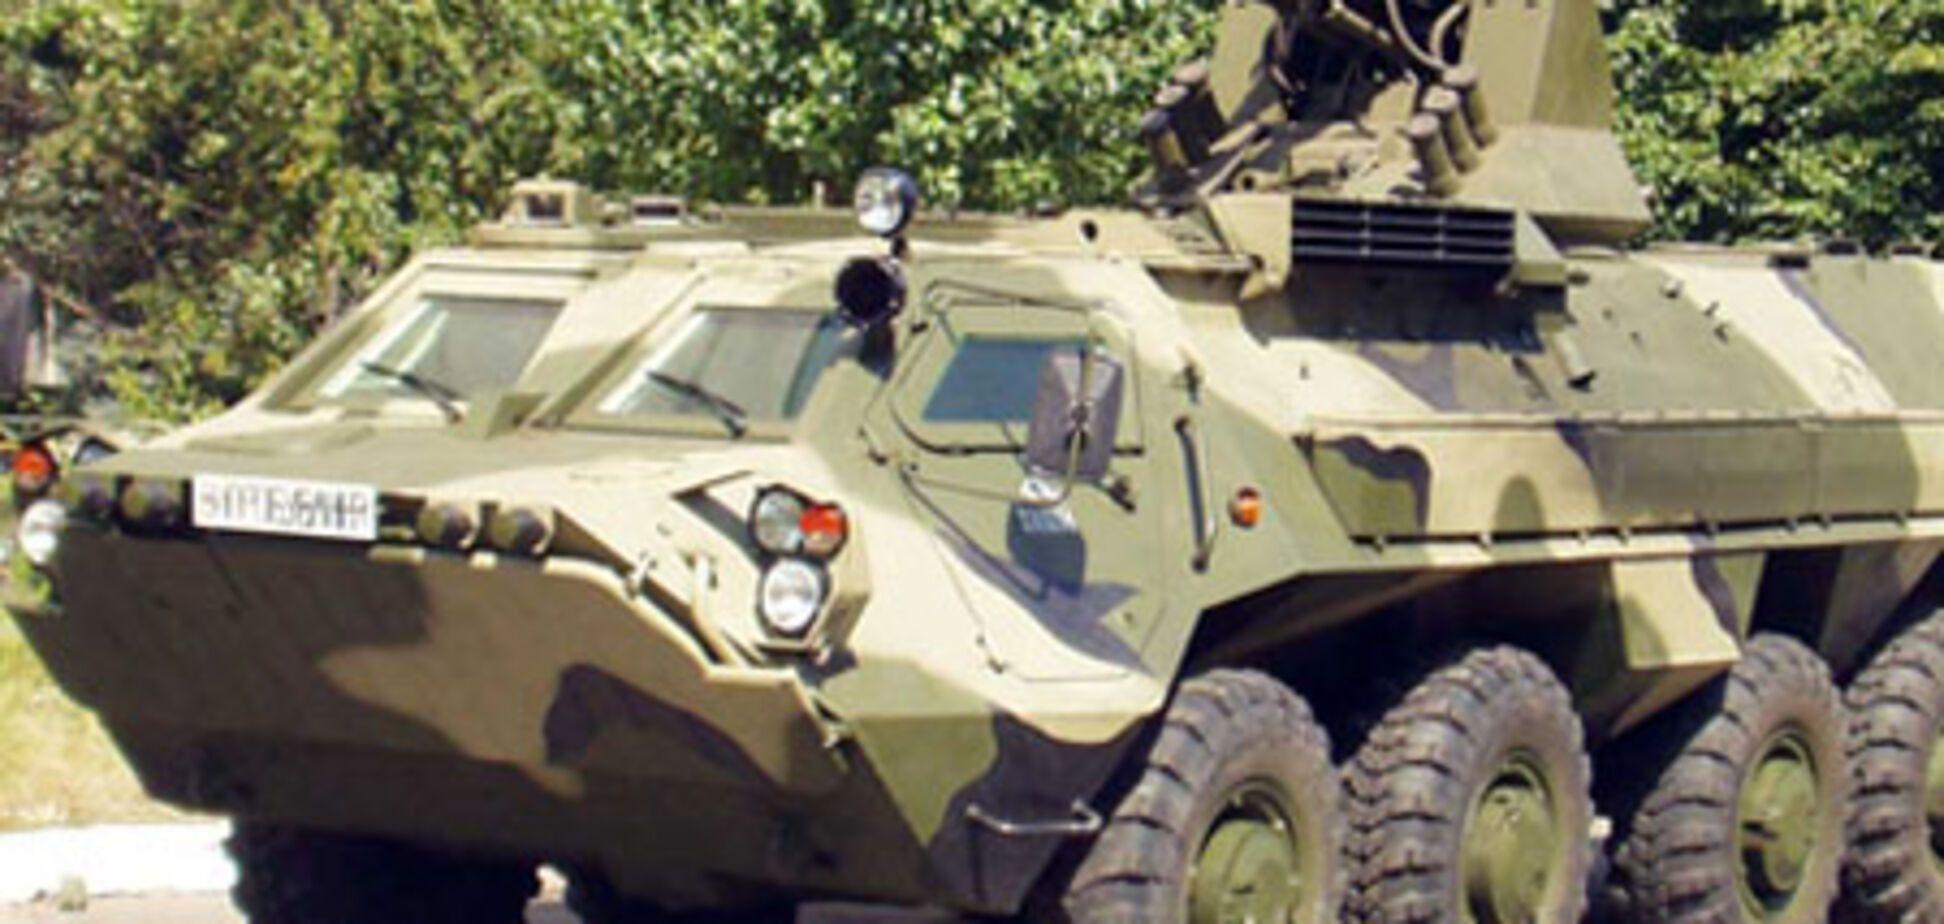 Навесні українська бронетехніка піде по землі Іраку